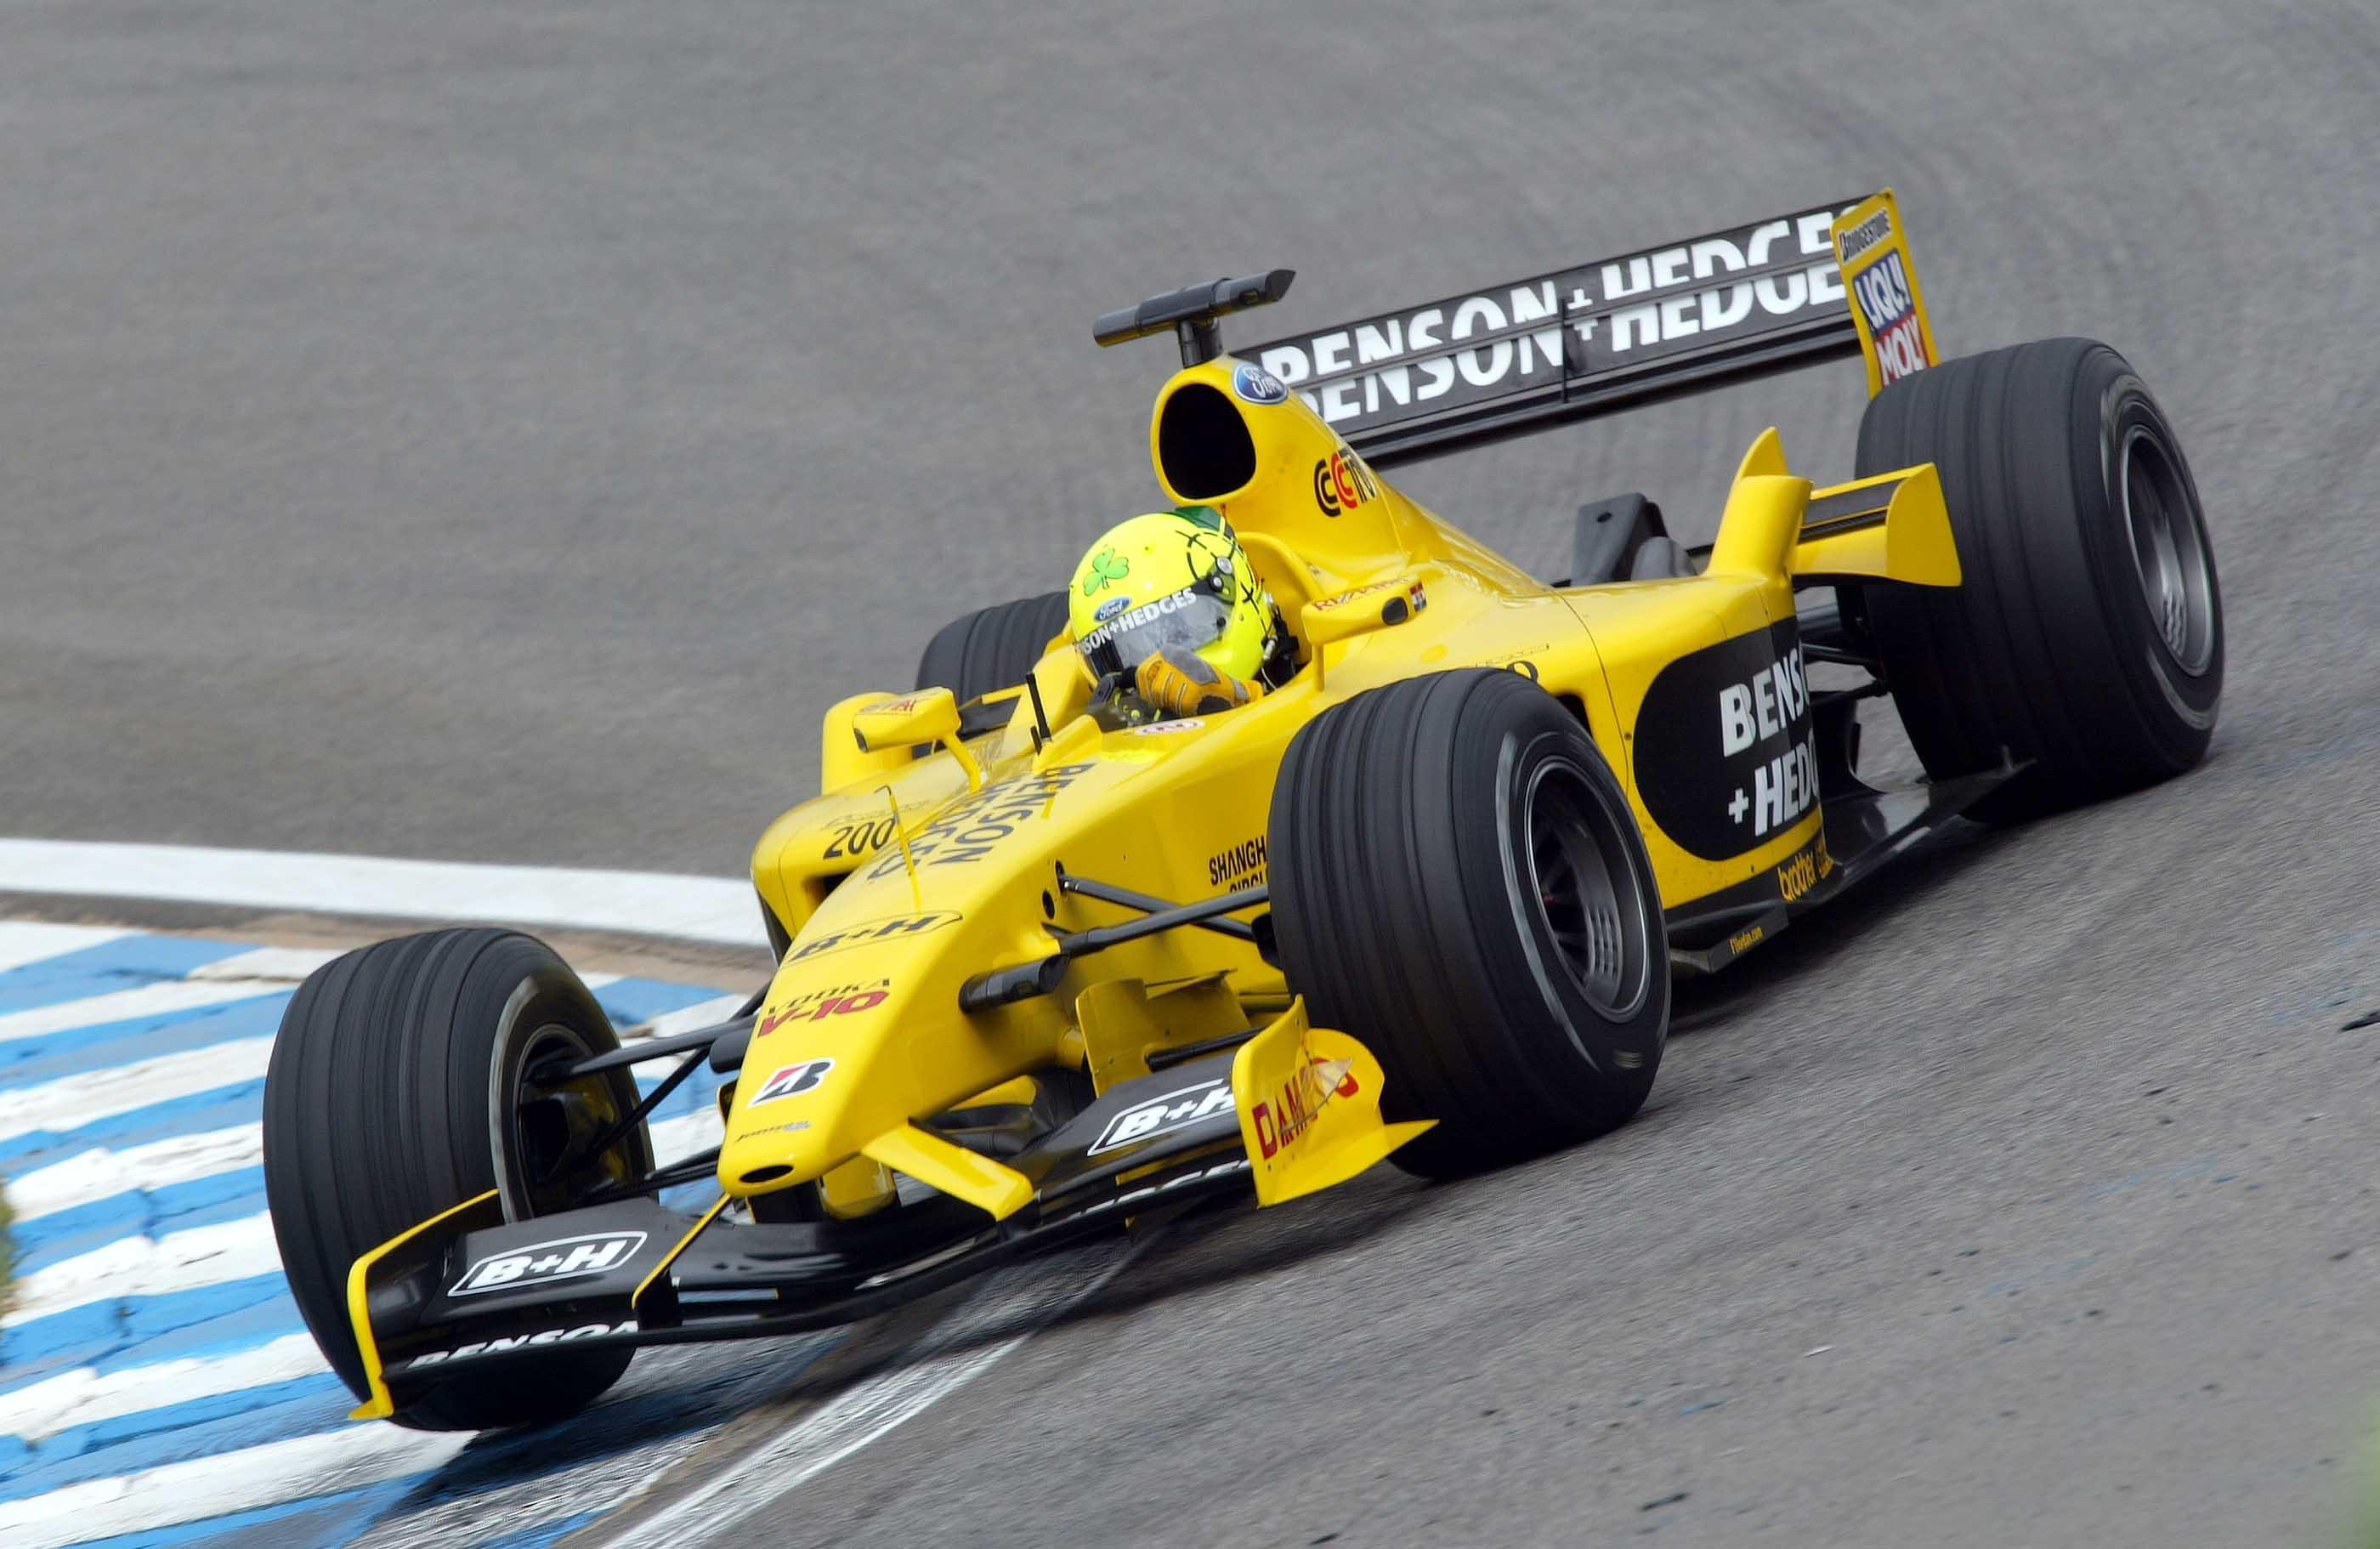 Sao Paolo, F1, Ralph Fireman (gb, Jordan Ford)